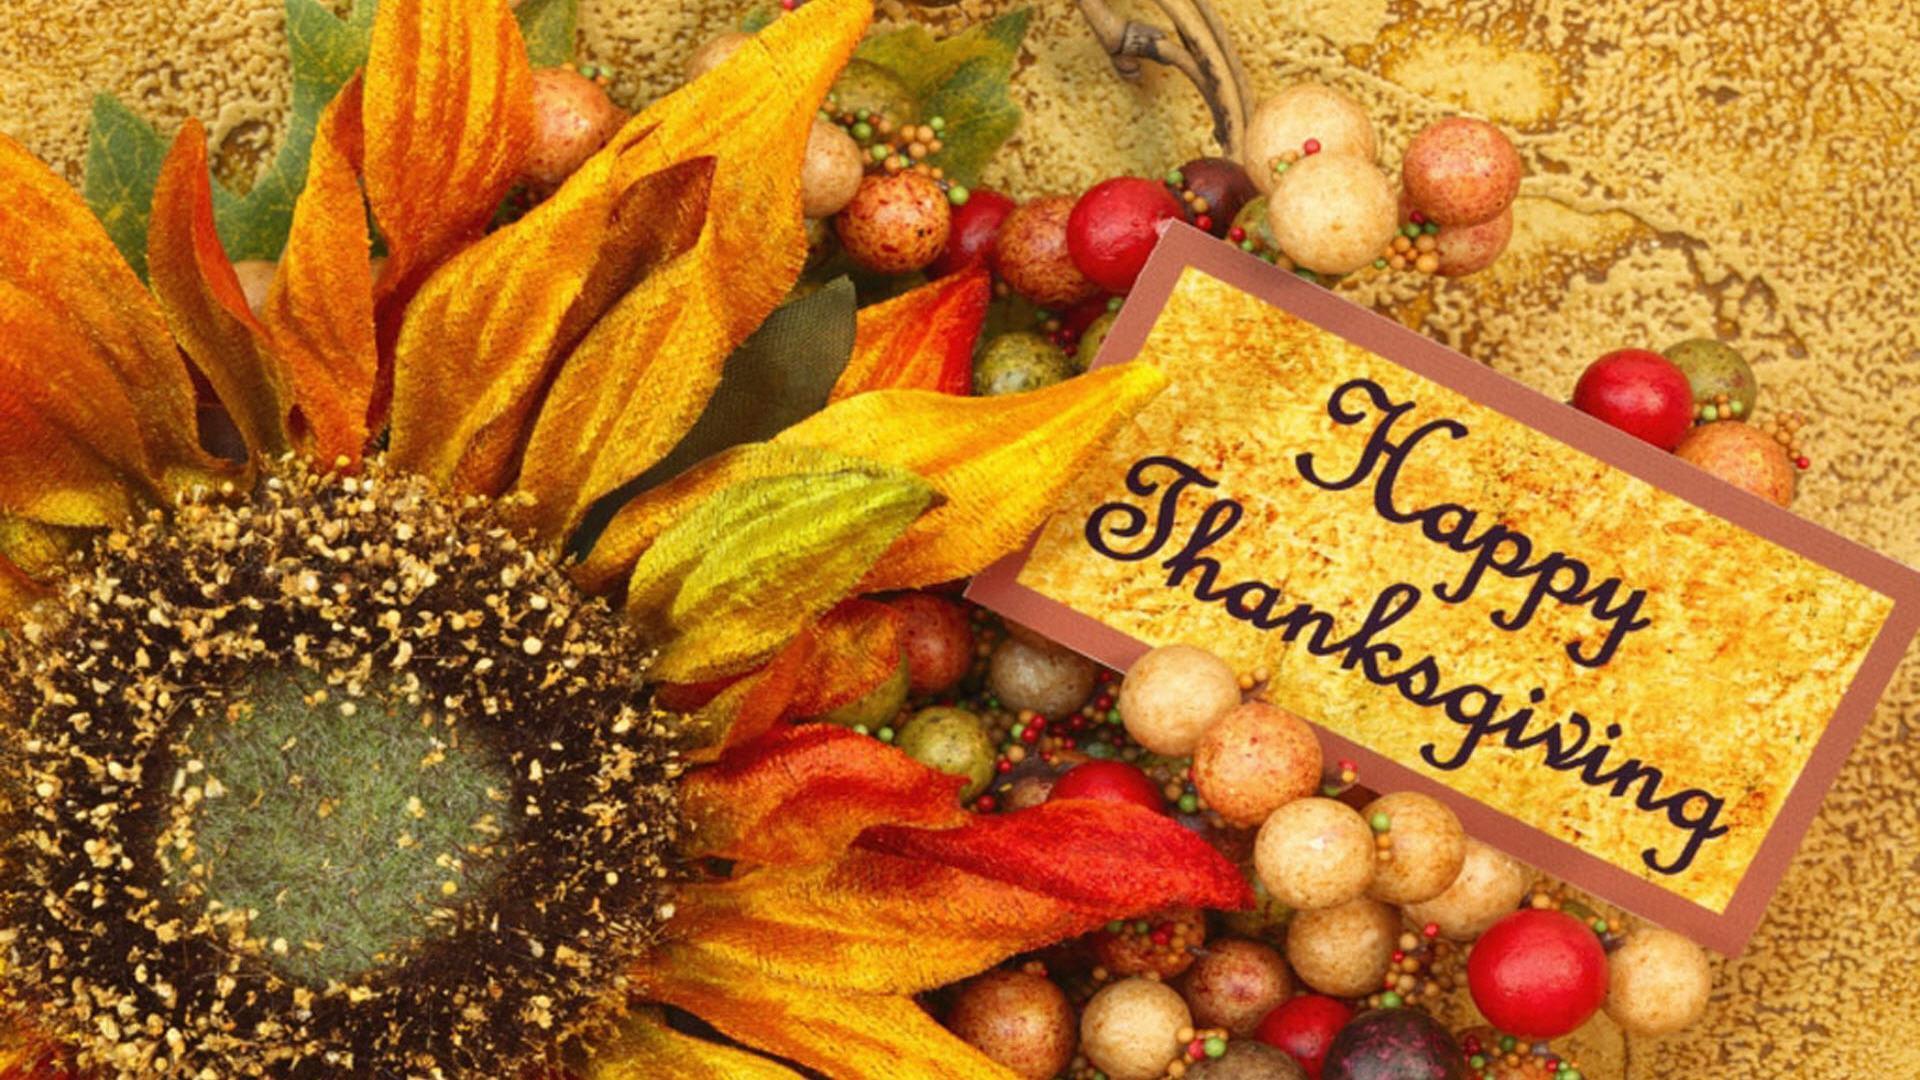 happy thanksgiving day flower desktop wallpaper   TheaBridge 1920x1080